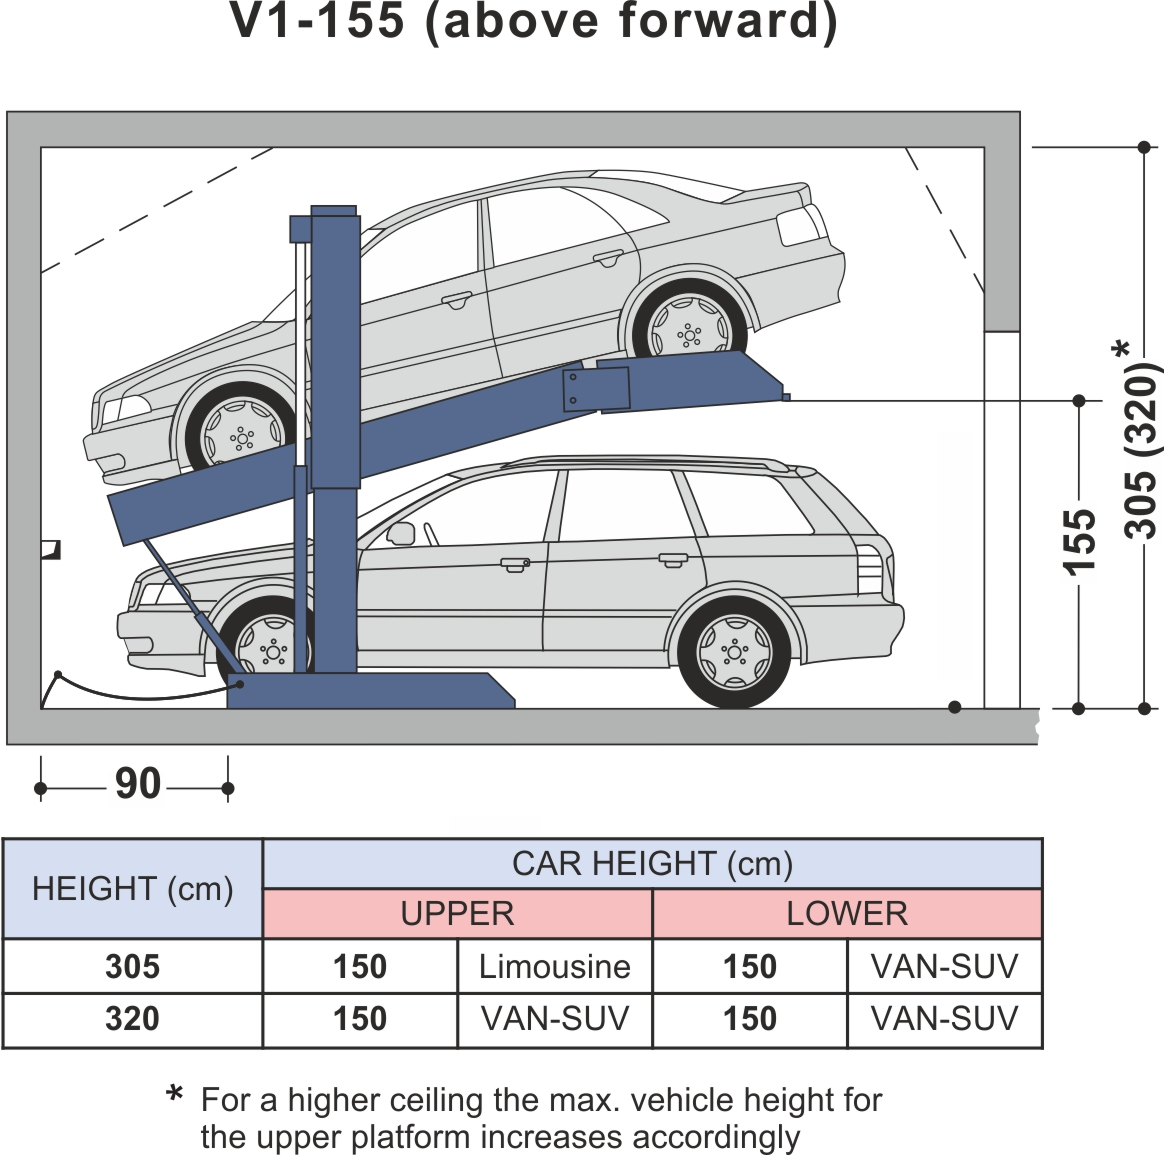 V1-forward-155-305-320